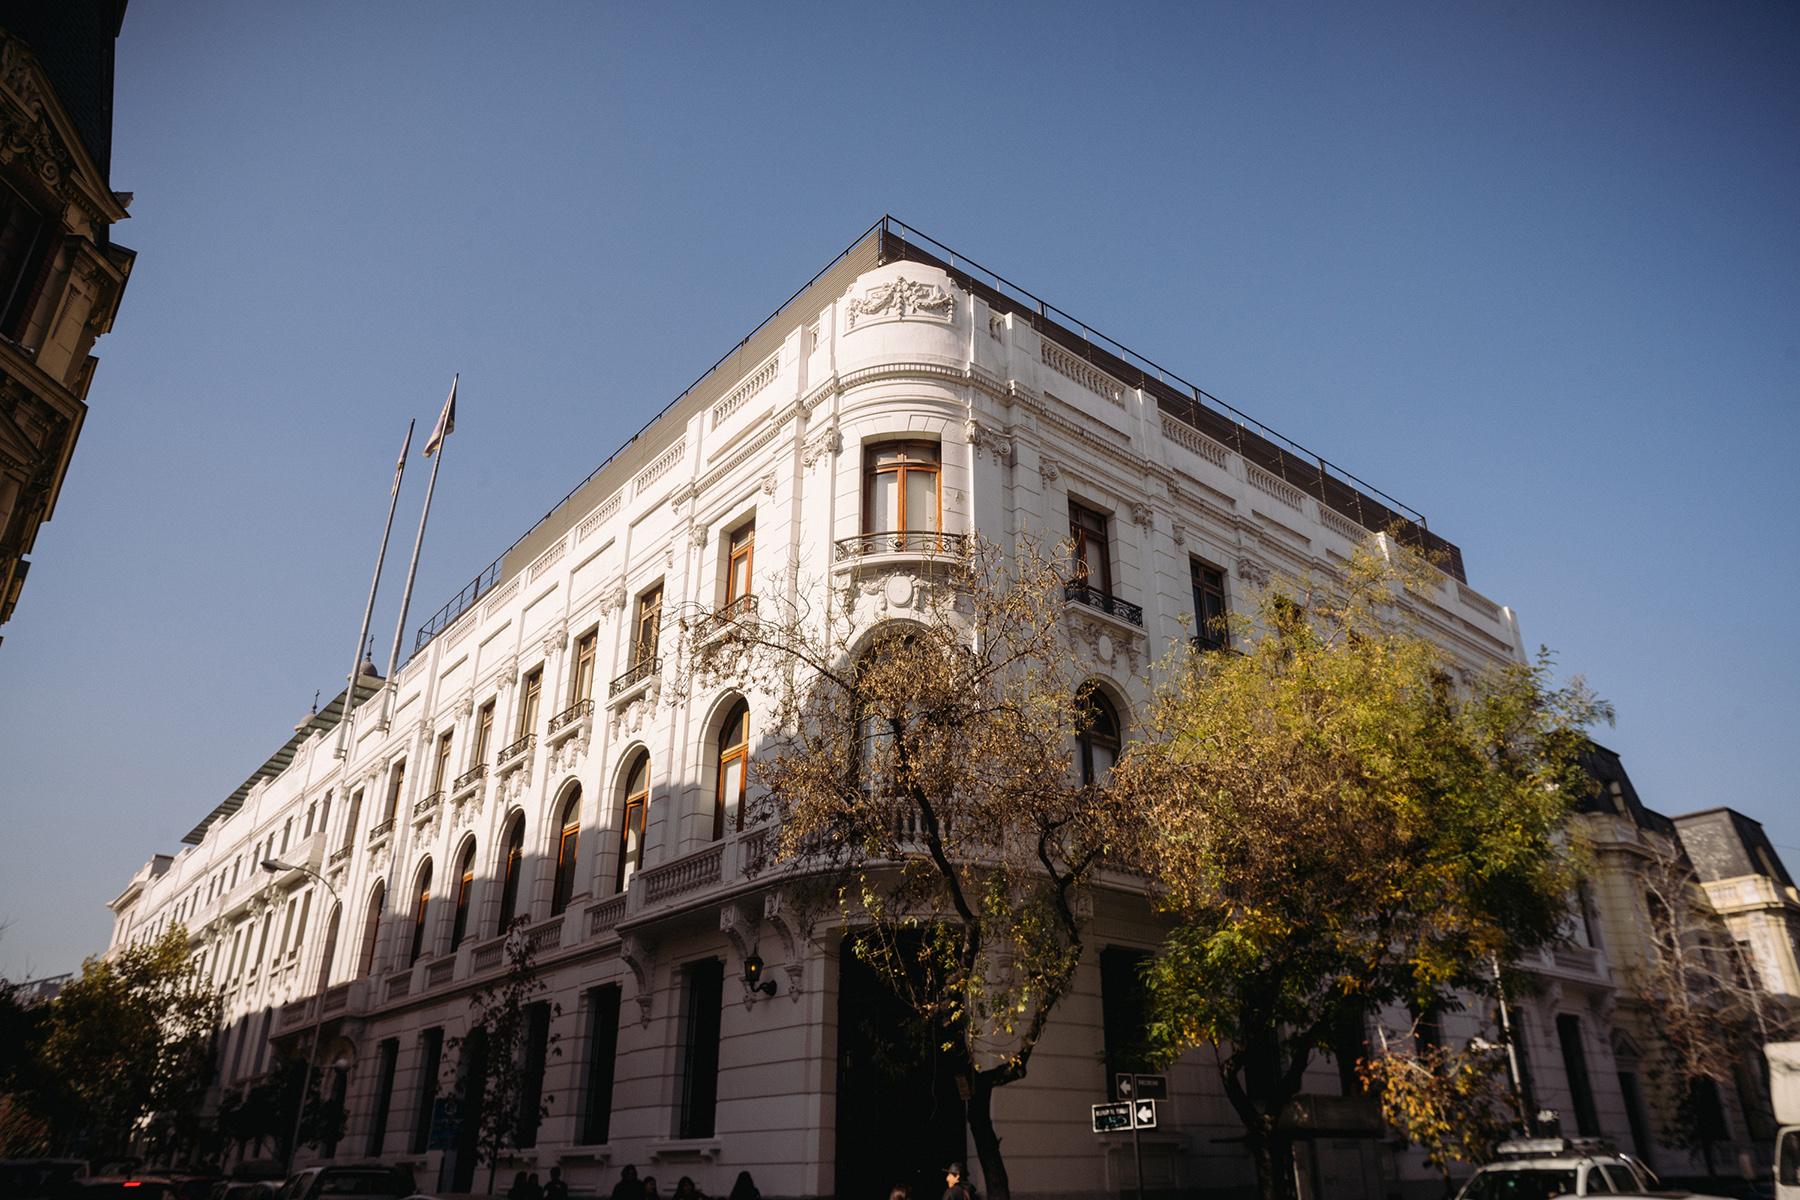 1_Palacio_eguiguren